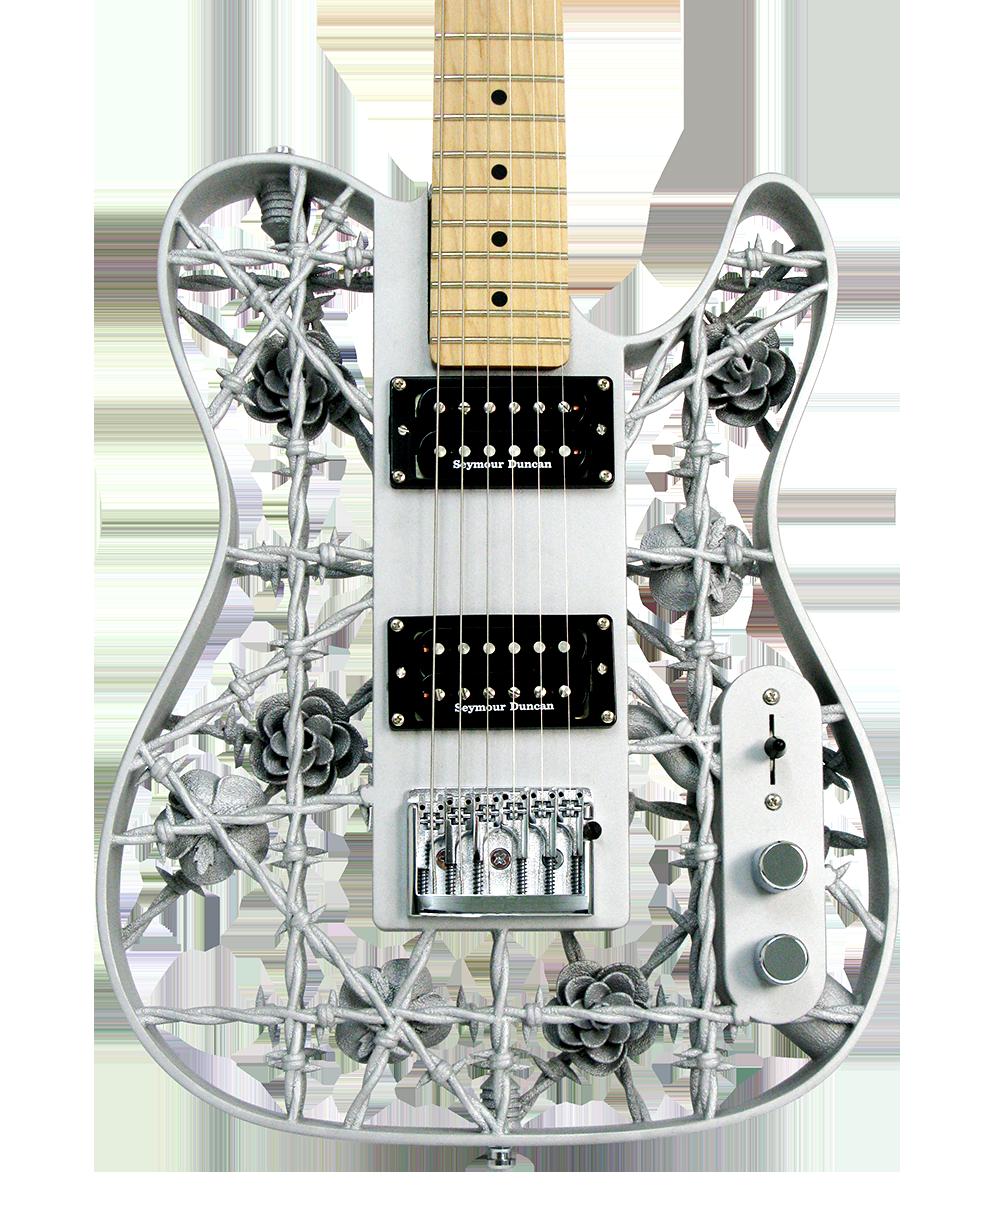 Figur 57. 3D printad elektrisk gitarr från Olaf Diegel.